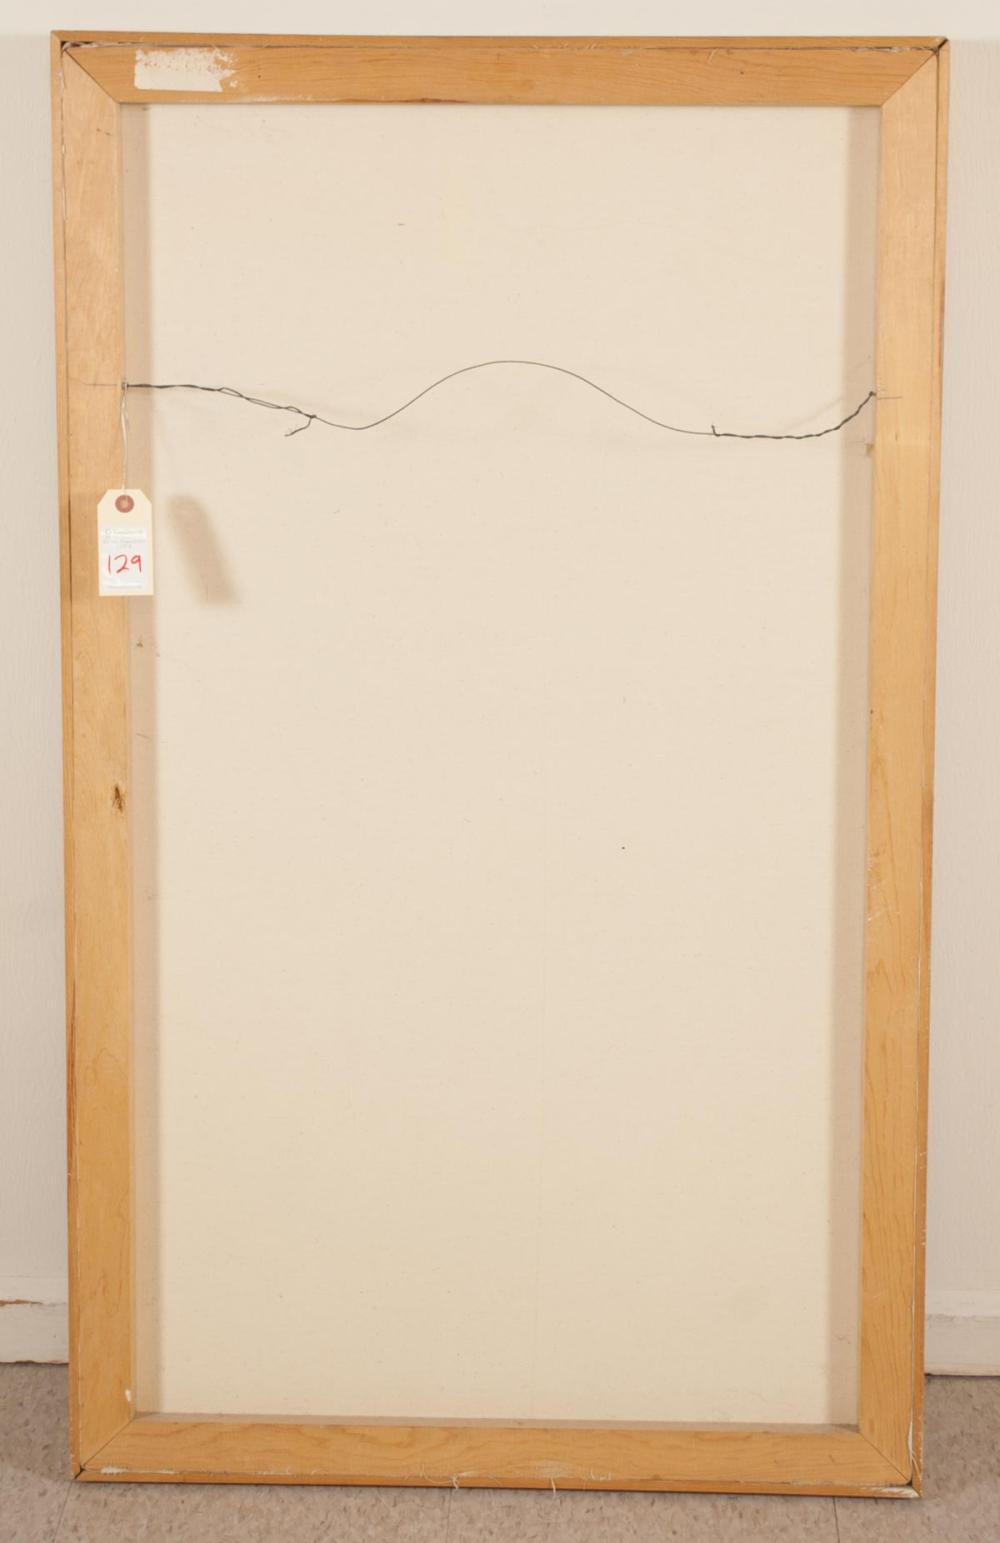 Lot 129: RUTH FLUNO (Washington, 1923-1974) acrylic on canv